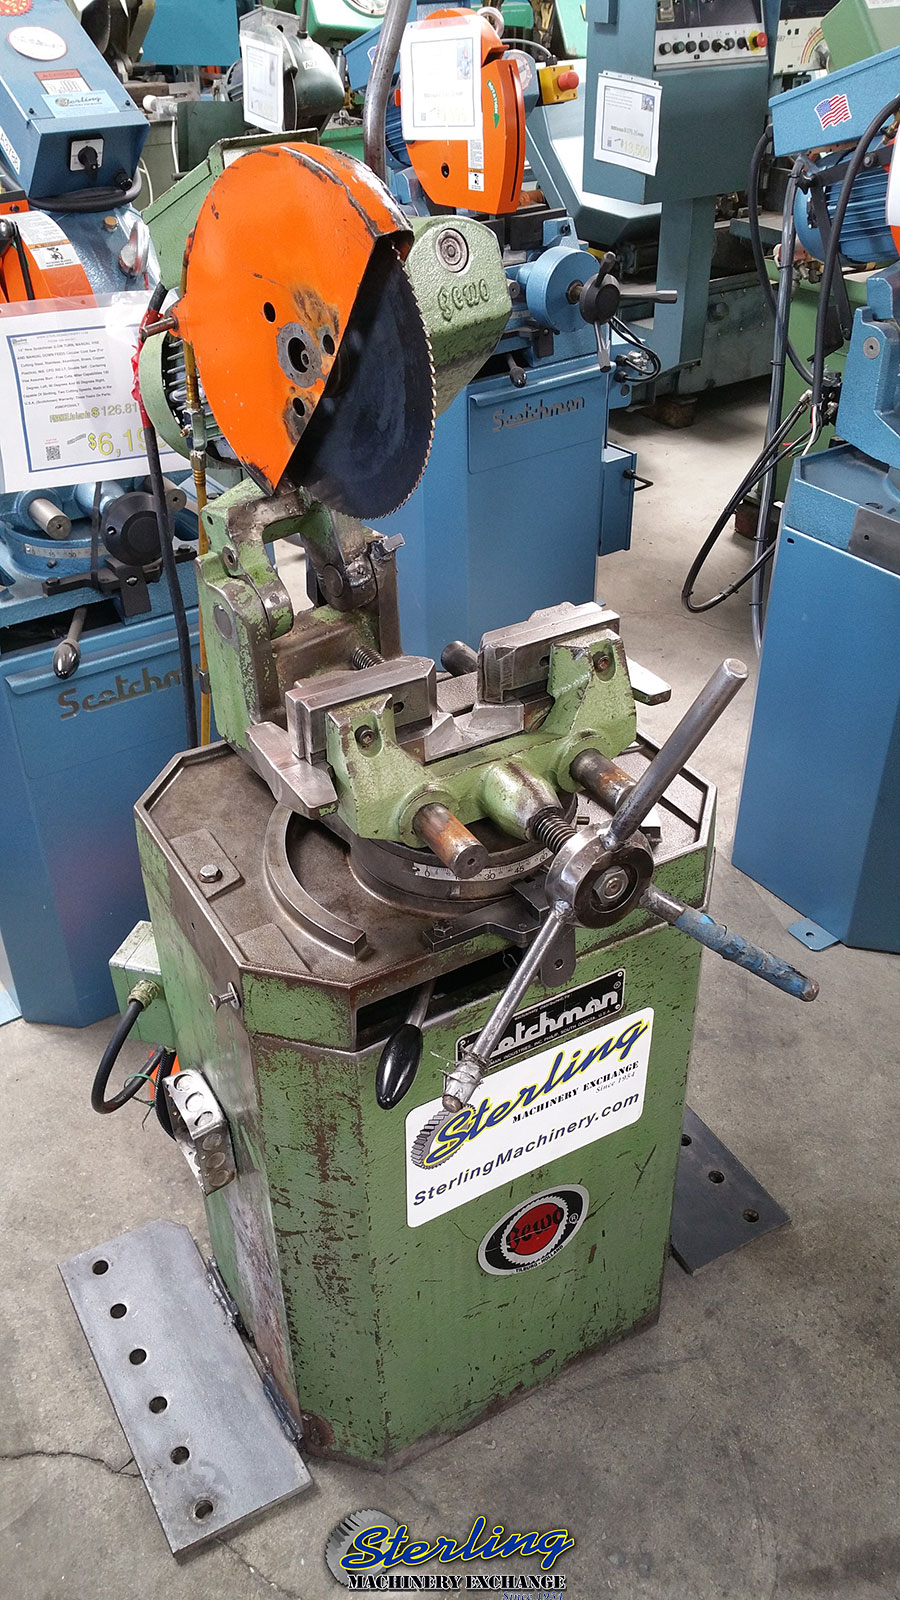 Used Scotchman Manual Circular Coldsaw Parts Machine